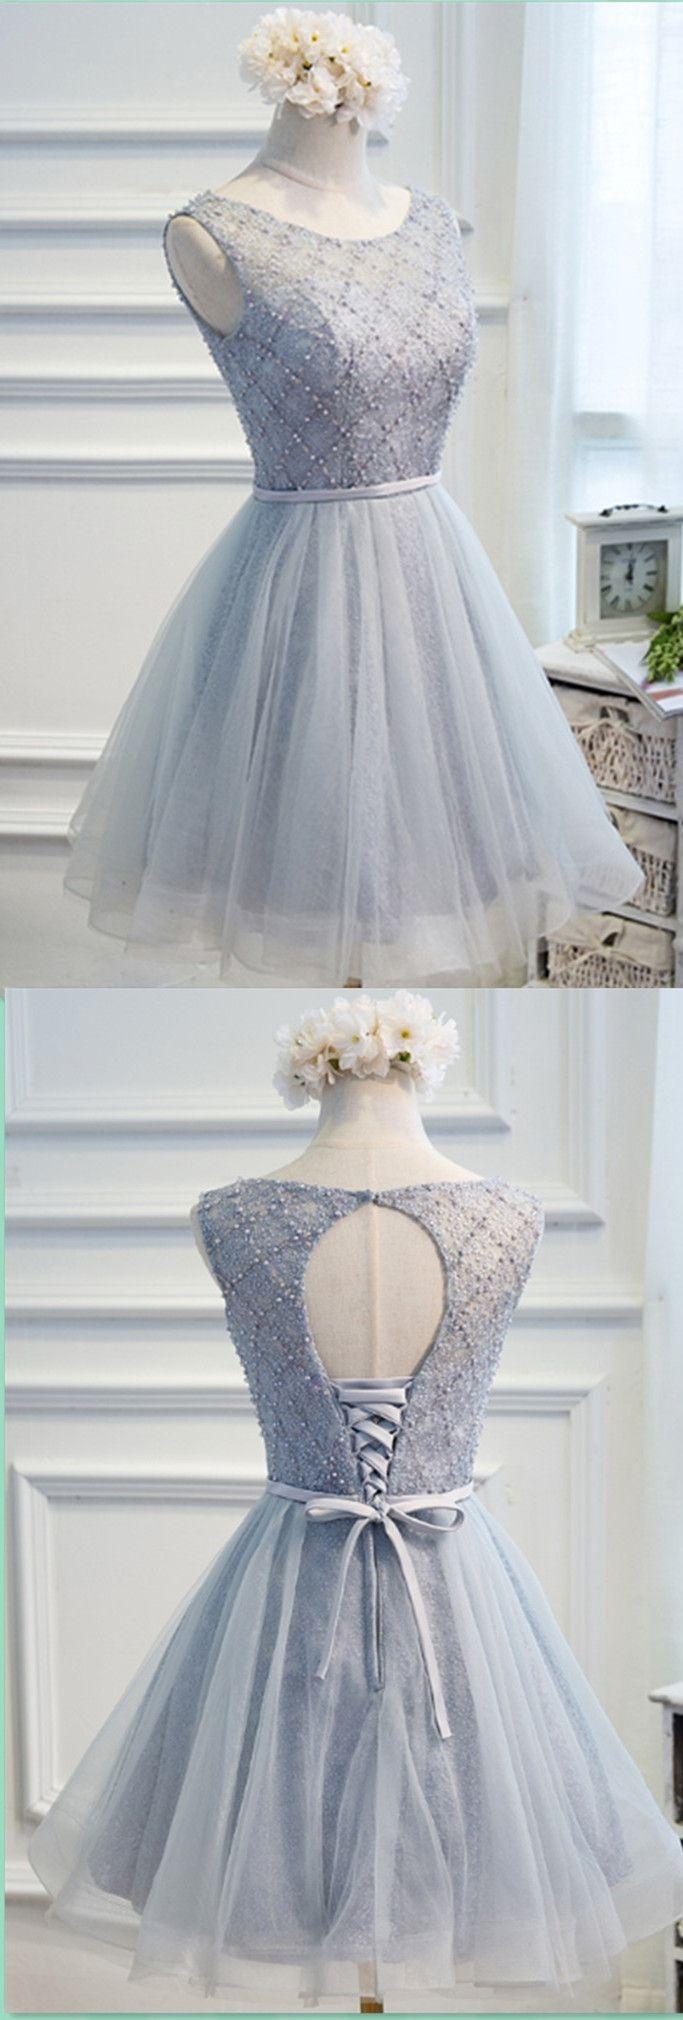 Beading Homecoming Dresses,Sexy Party Dress,Charming Homecoming Dress,Graduation Dress,Homecoming Dress,Short Prom Dress